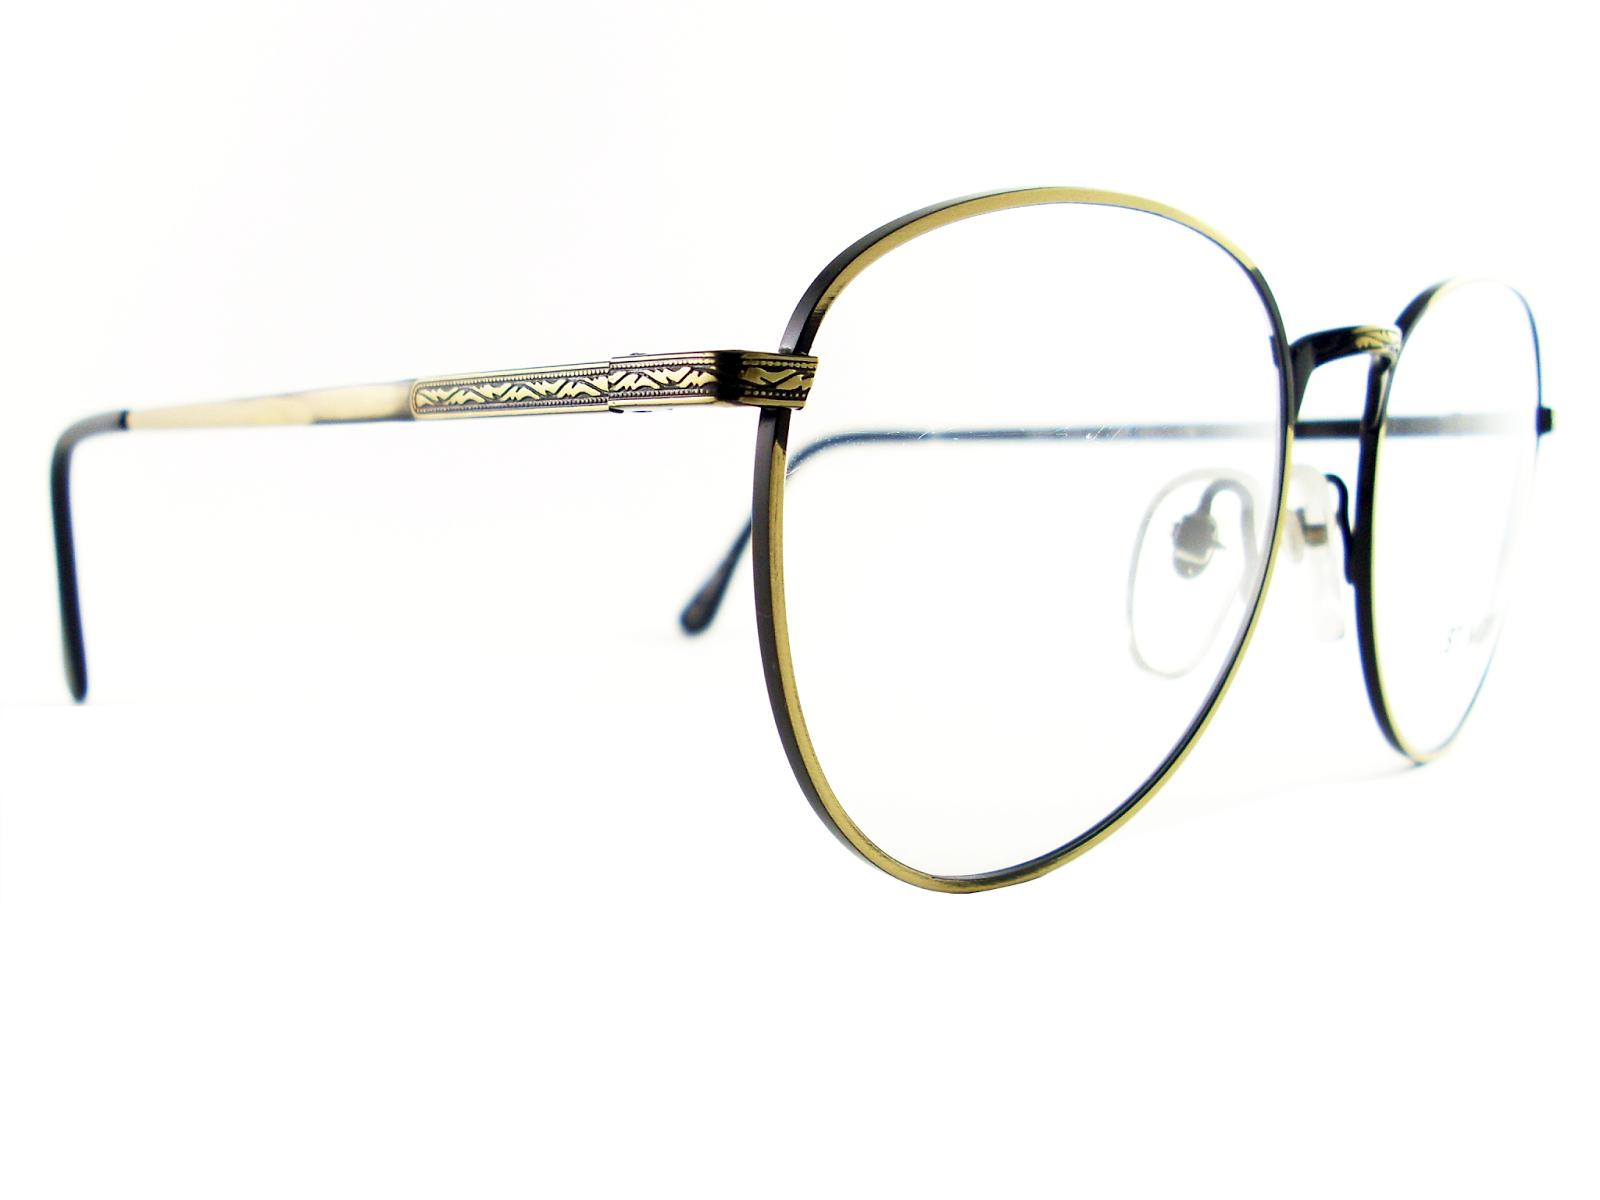 2ec1fe9d1b Antique Gold Eyeglasses - Bitterroot Public Library